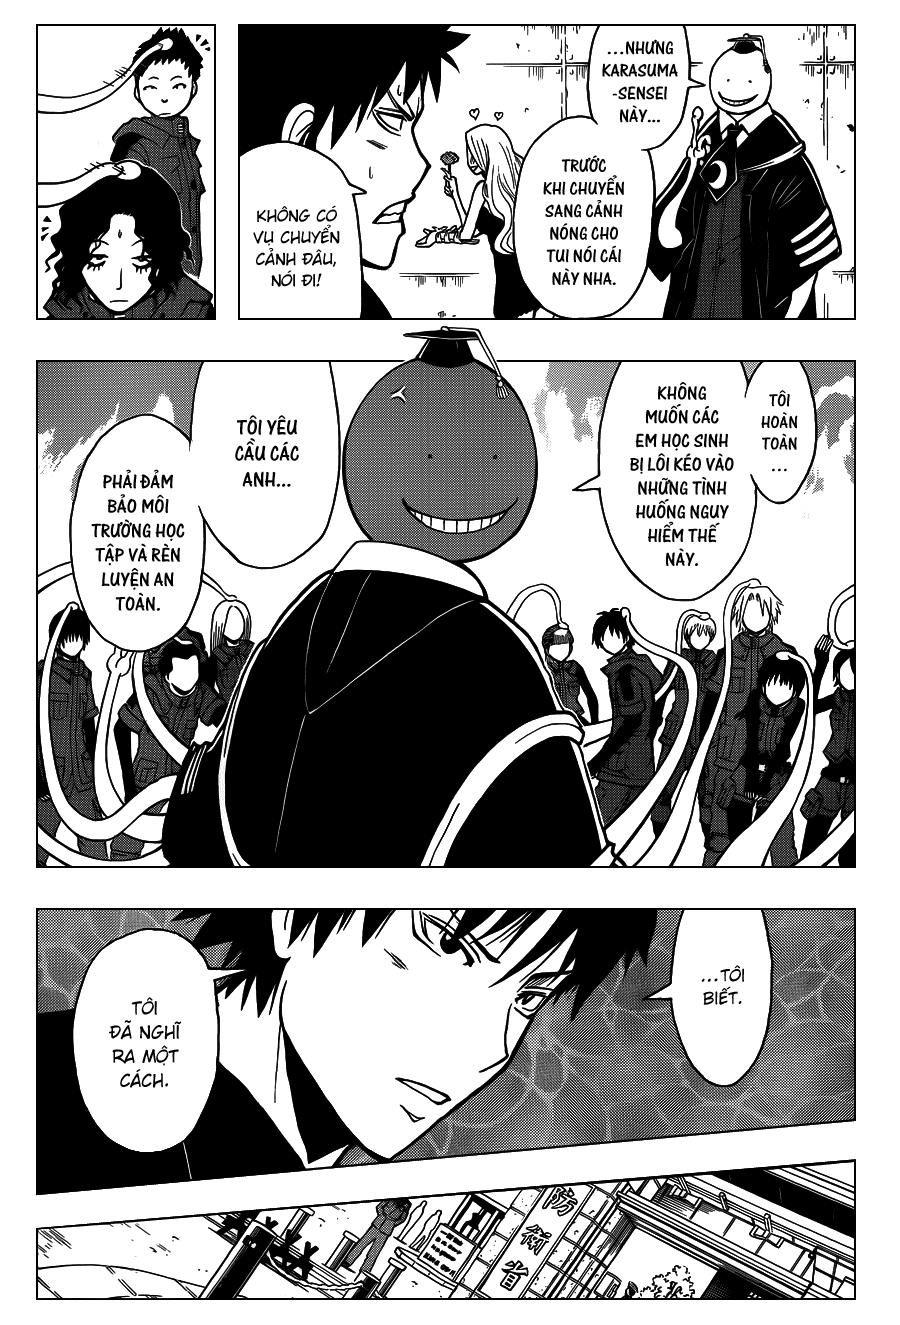 Ansatsu Kyoushitsu chap 110 trang 12